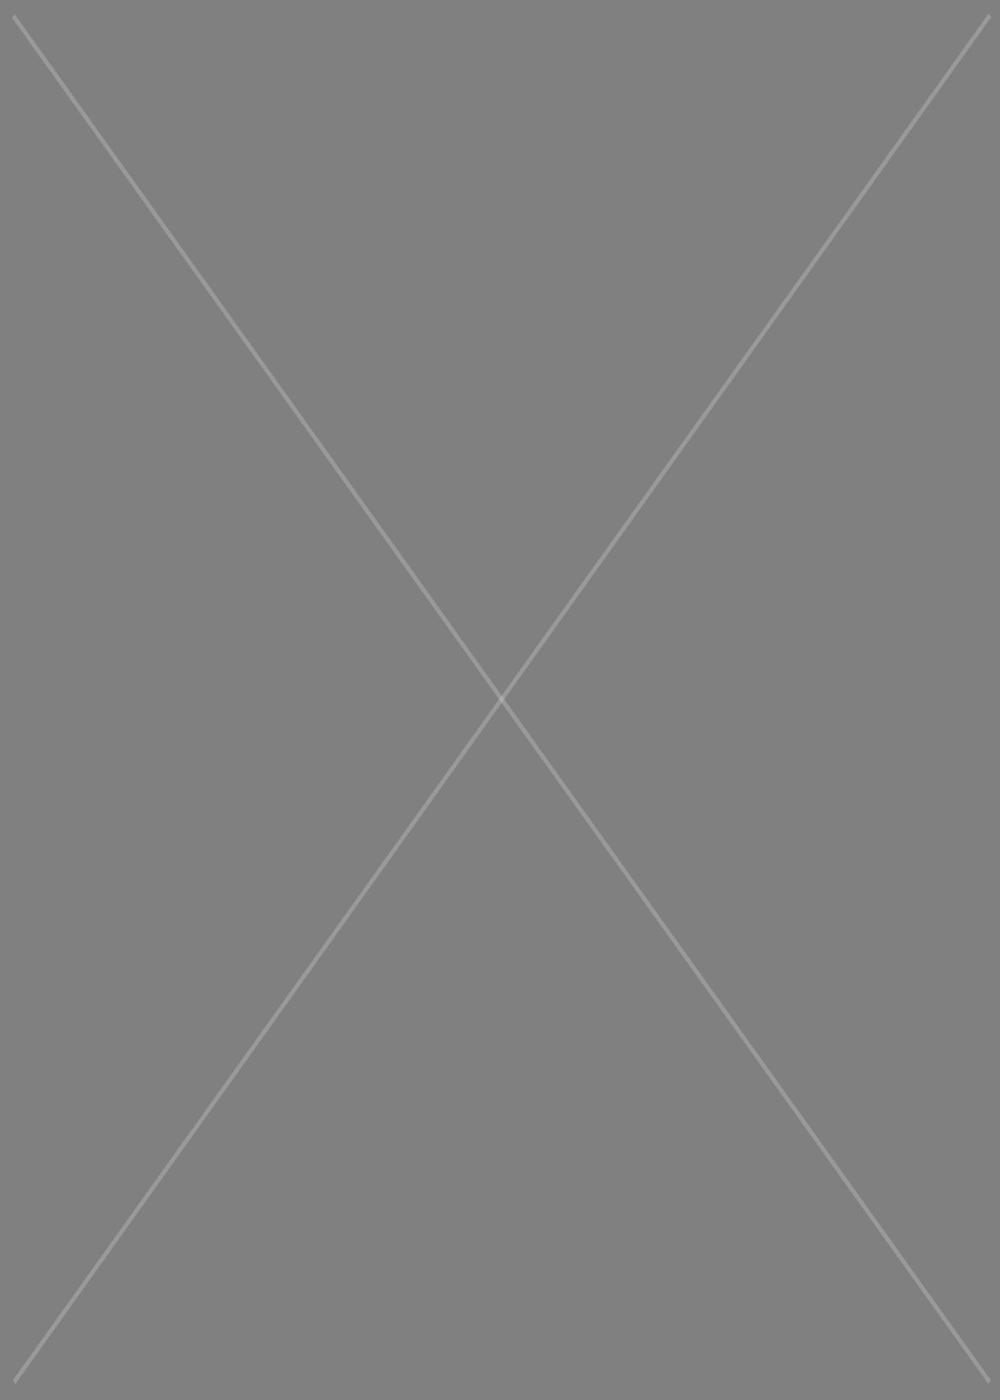 placeholderP.jpg